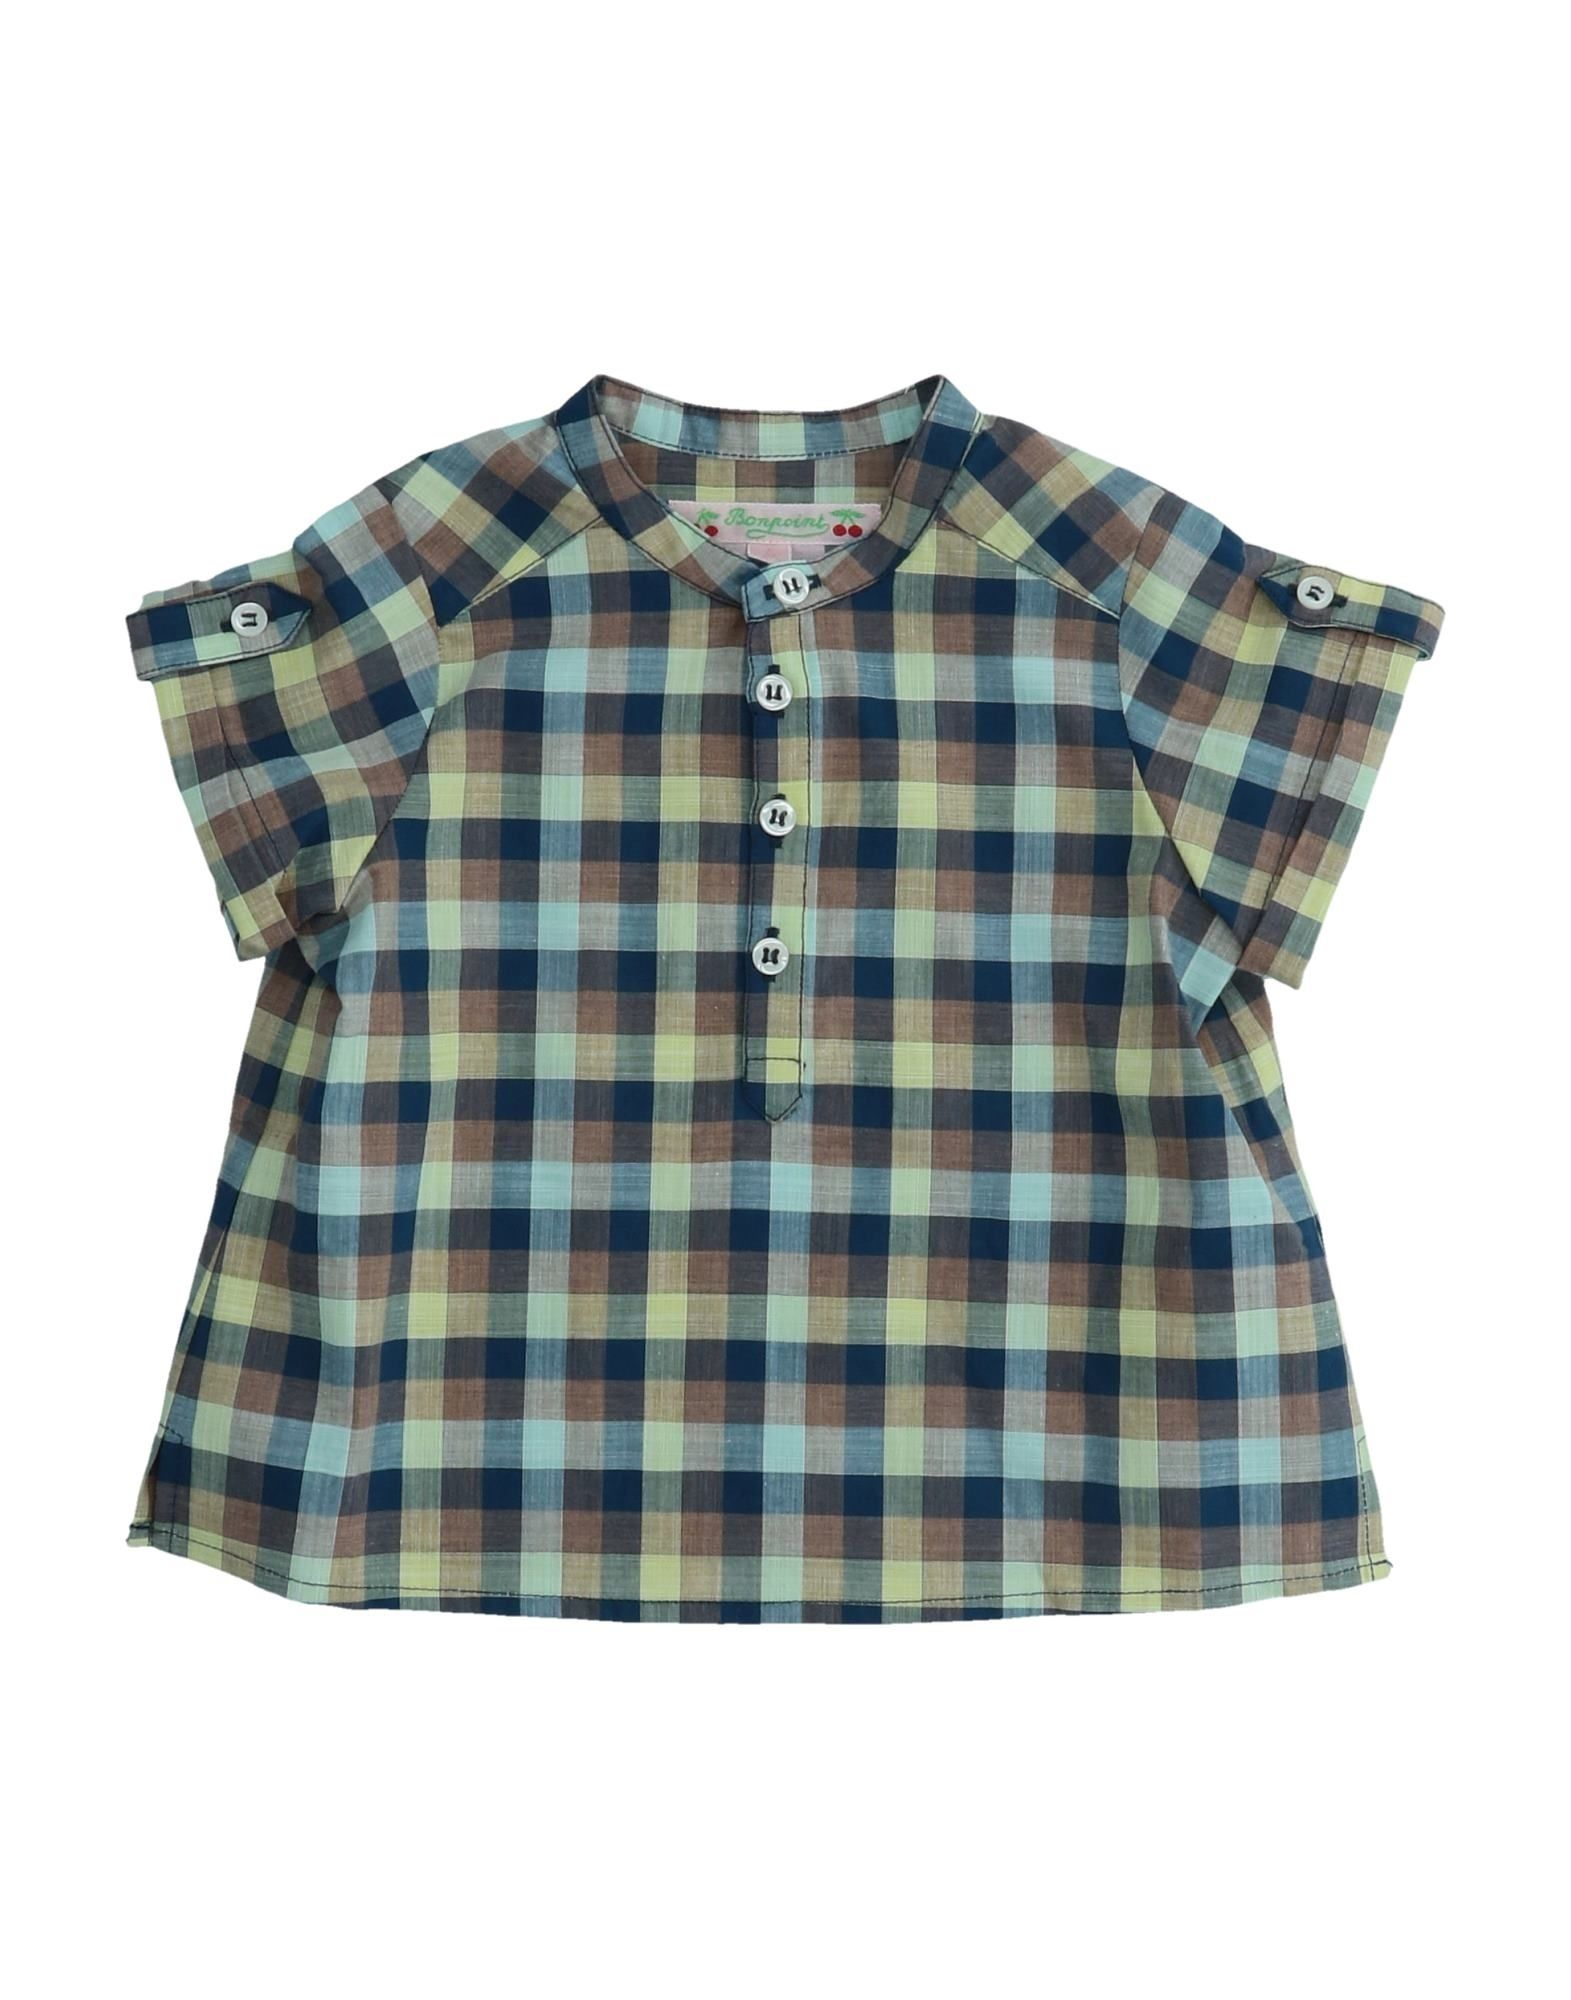 BONPOINT Блузка bonpoint джинсовая блузка с рюшами на воротнике